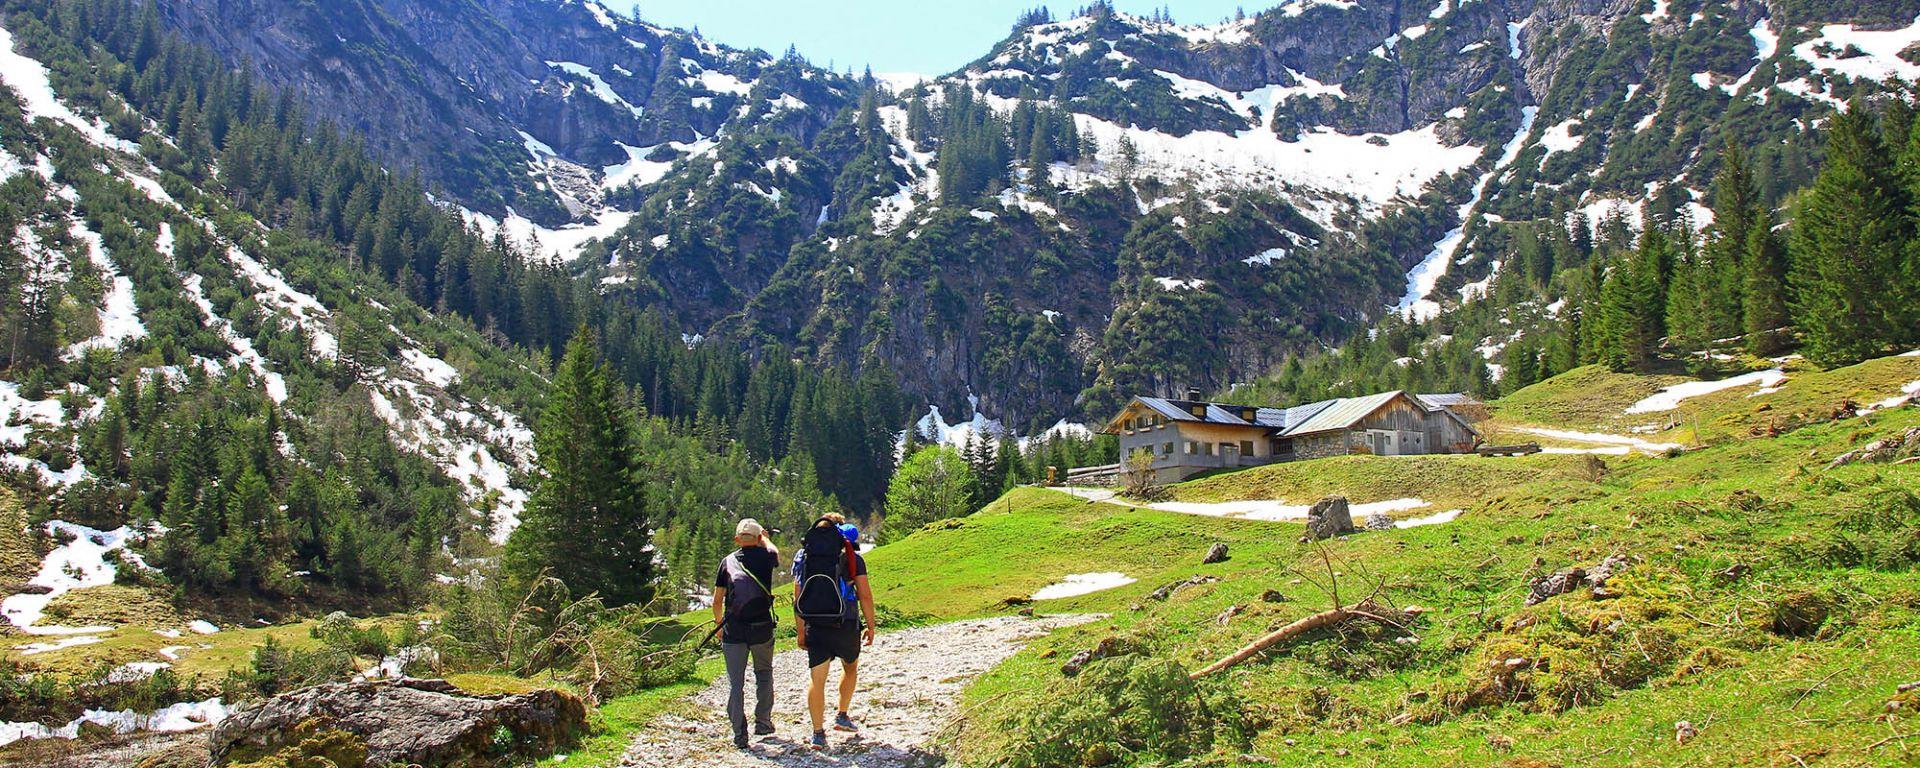 St Johann Austria Walking Tour Header Copy